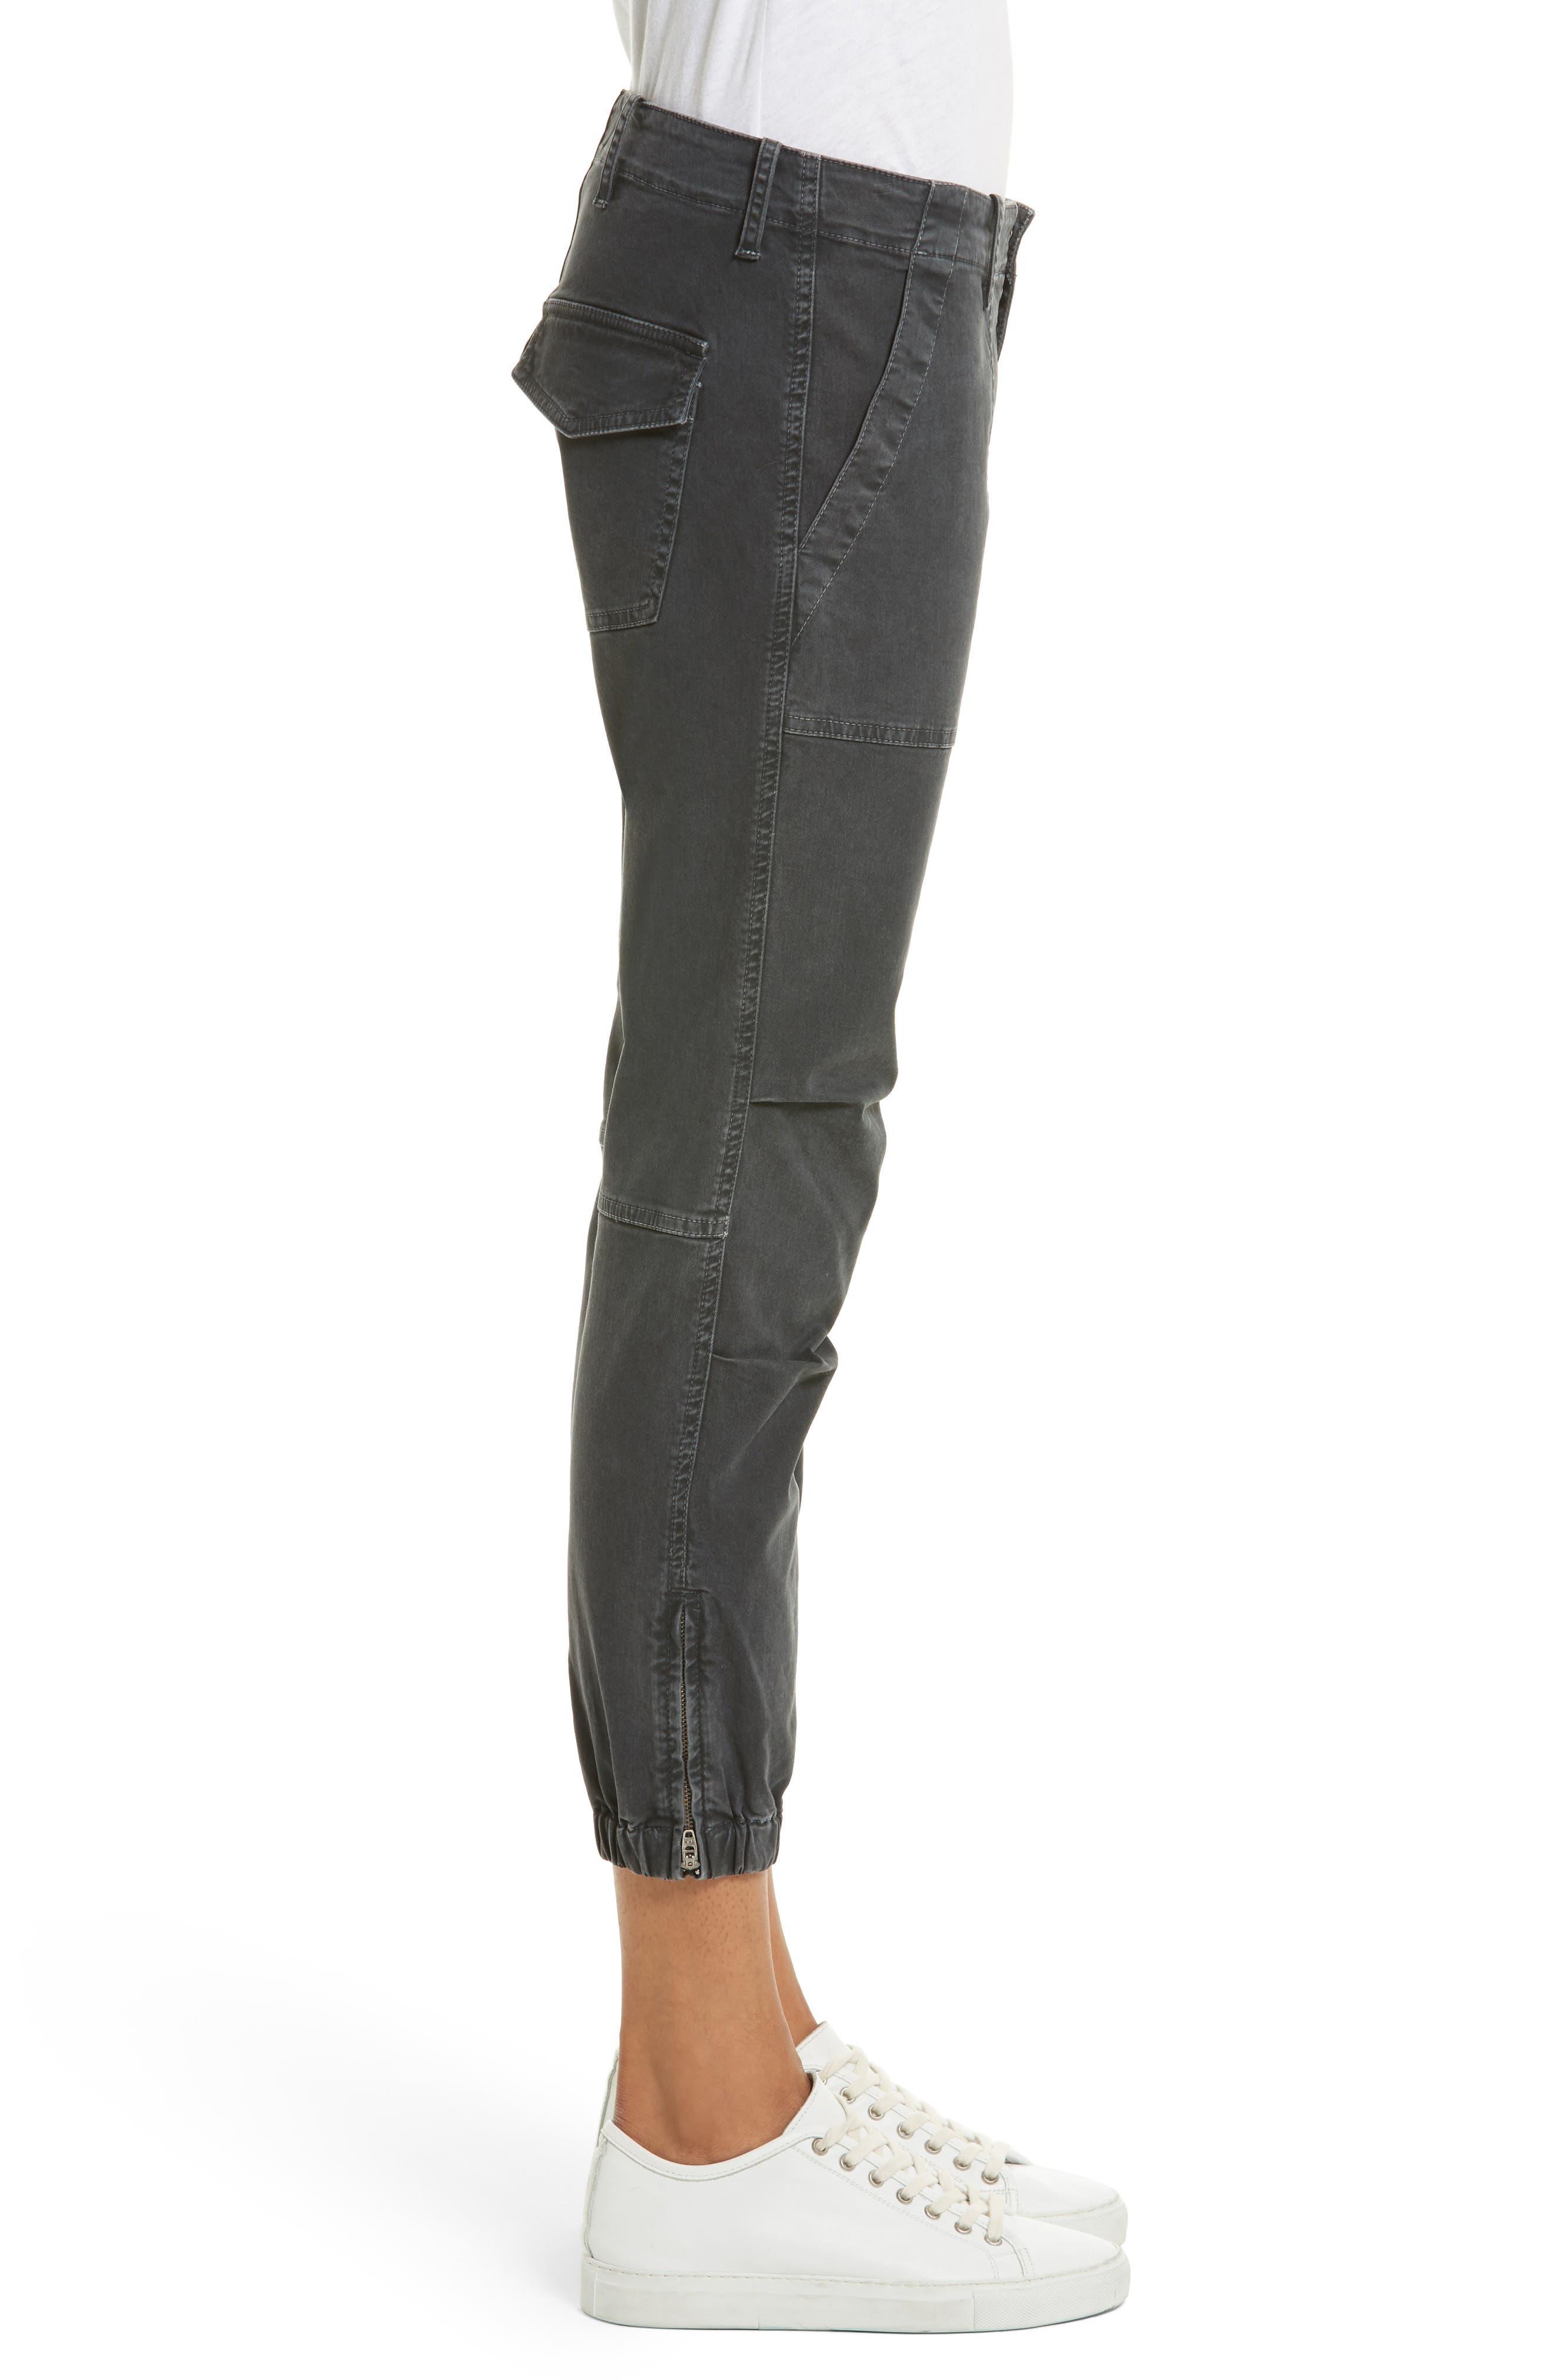 NILI LOTAN, Stretch Cotton Twill Crop Military Pants, Alternate thumbnail 4, color, CARBON